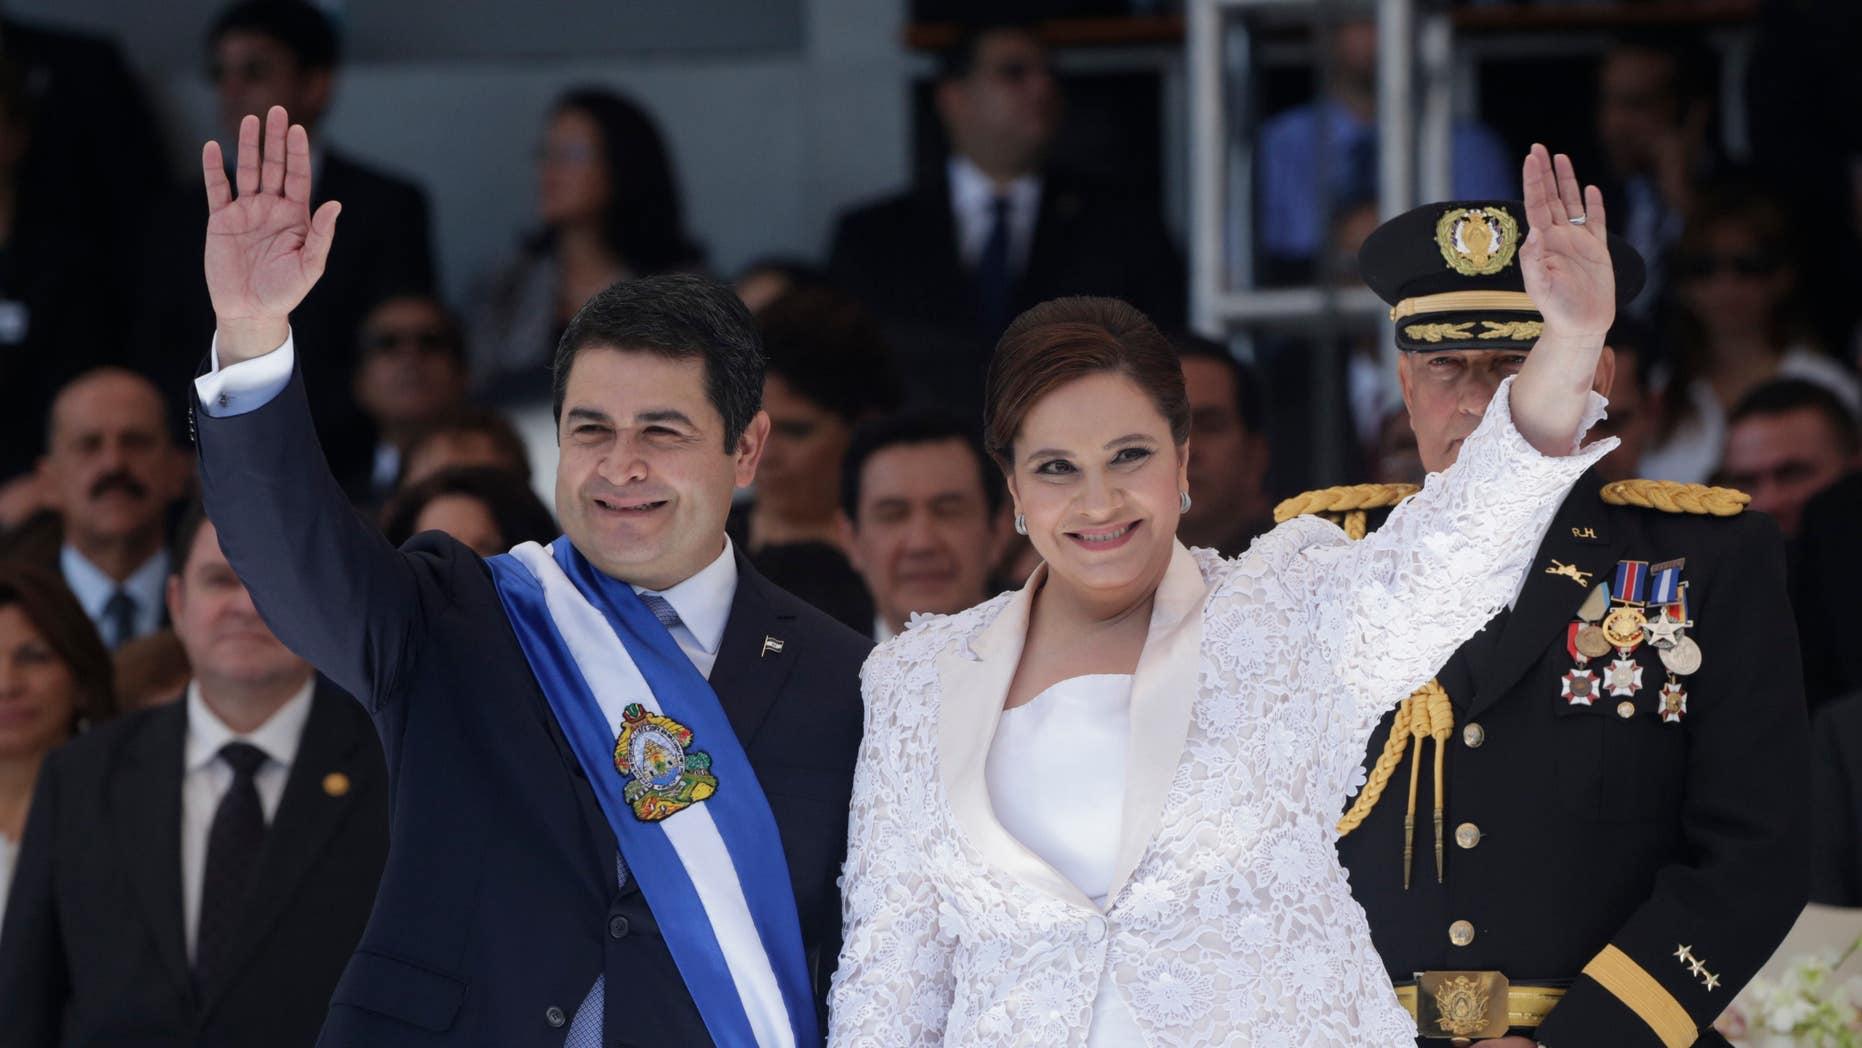 Honduras' President Juan Orlando Hernandez, left, and his wife Ana Rosalinda wave after his swearing in ceremony as new president in Tegucigalpa, Honduras, Monday, Jan. 27, 2014. (AP Photo/Arnulfo Franco)